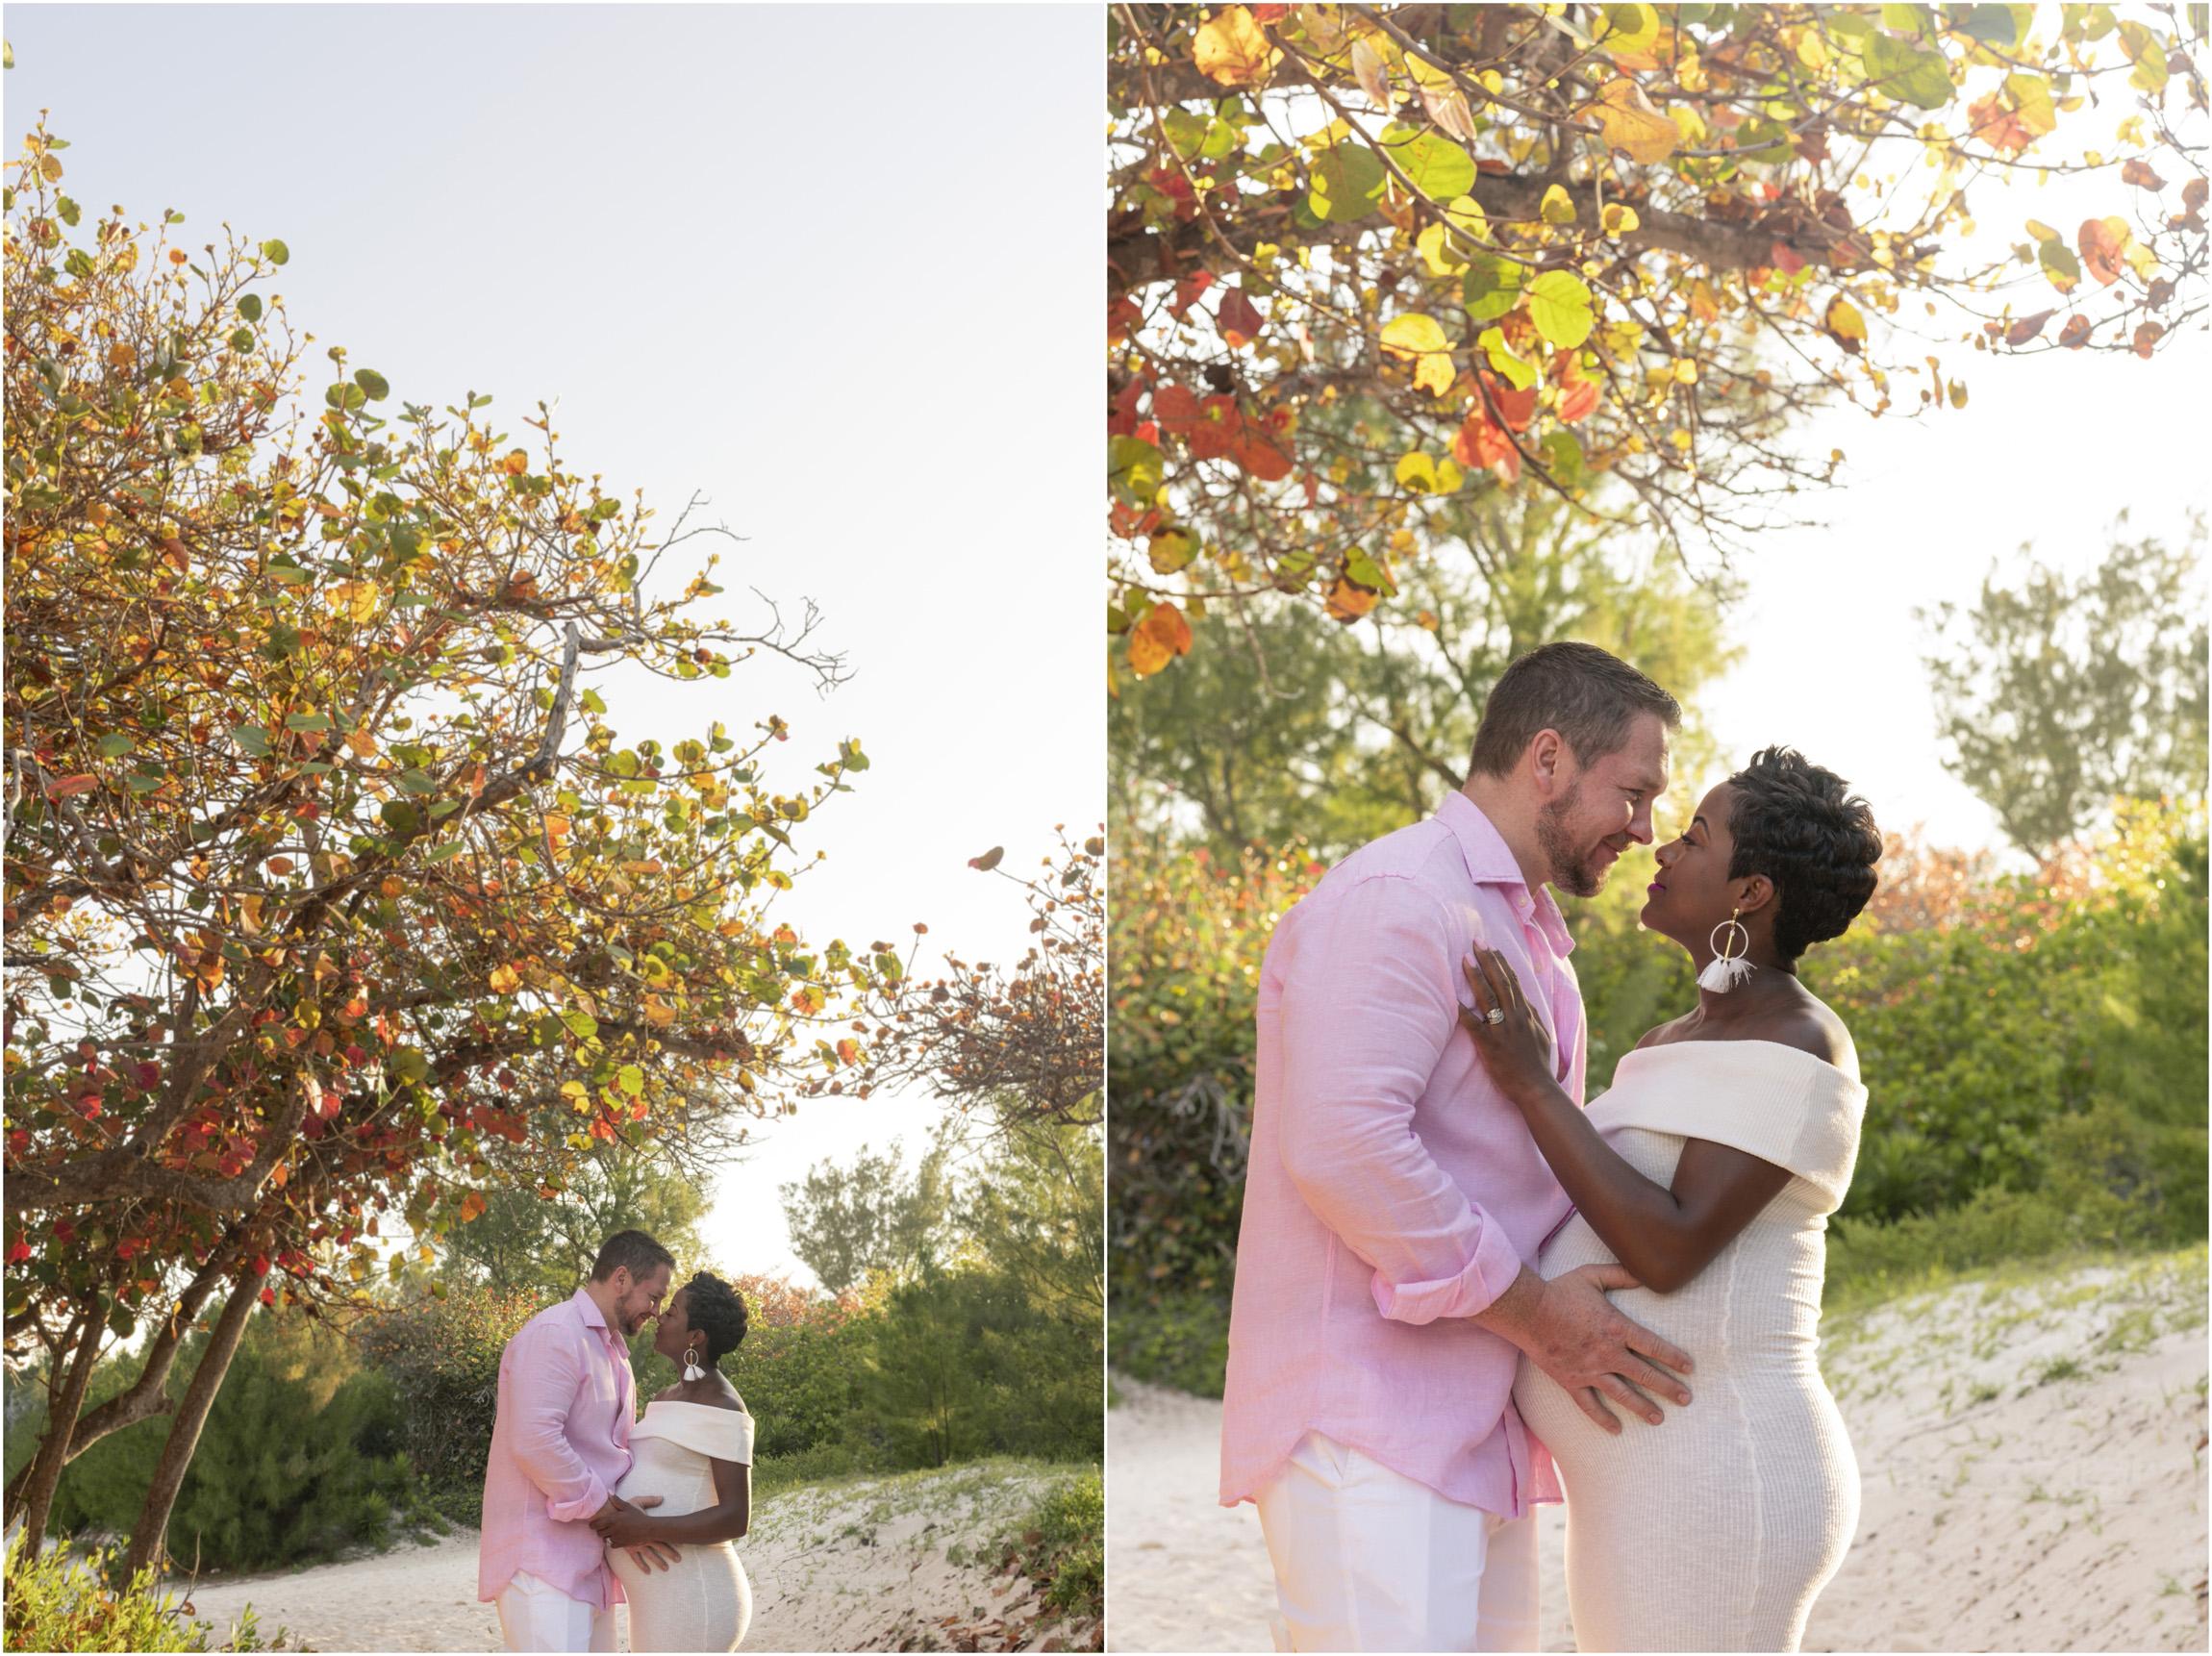 ©FianderFoto_Bermuda Maternity Photographer_Jennifer_Jonathan_025.jpg